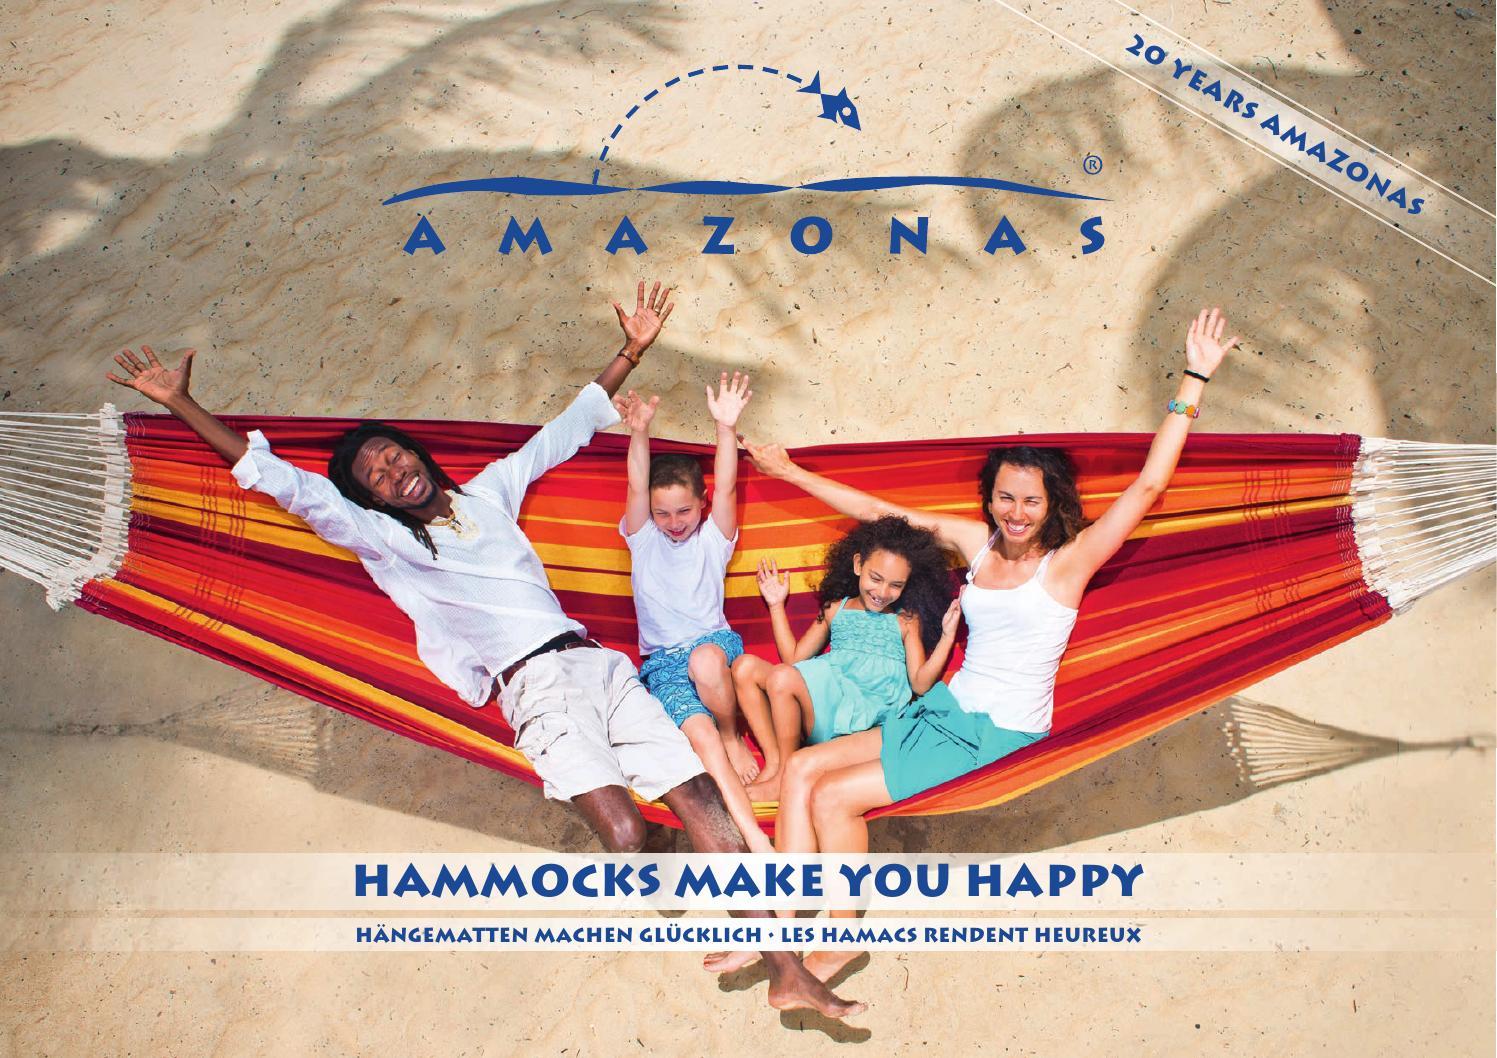 amazonas catalog by amazonas issuu. Black Bedroom Furniture Sets. Home Design Ideas